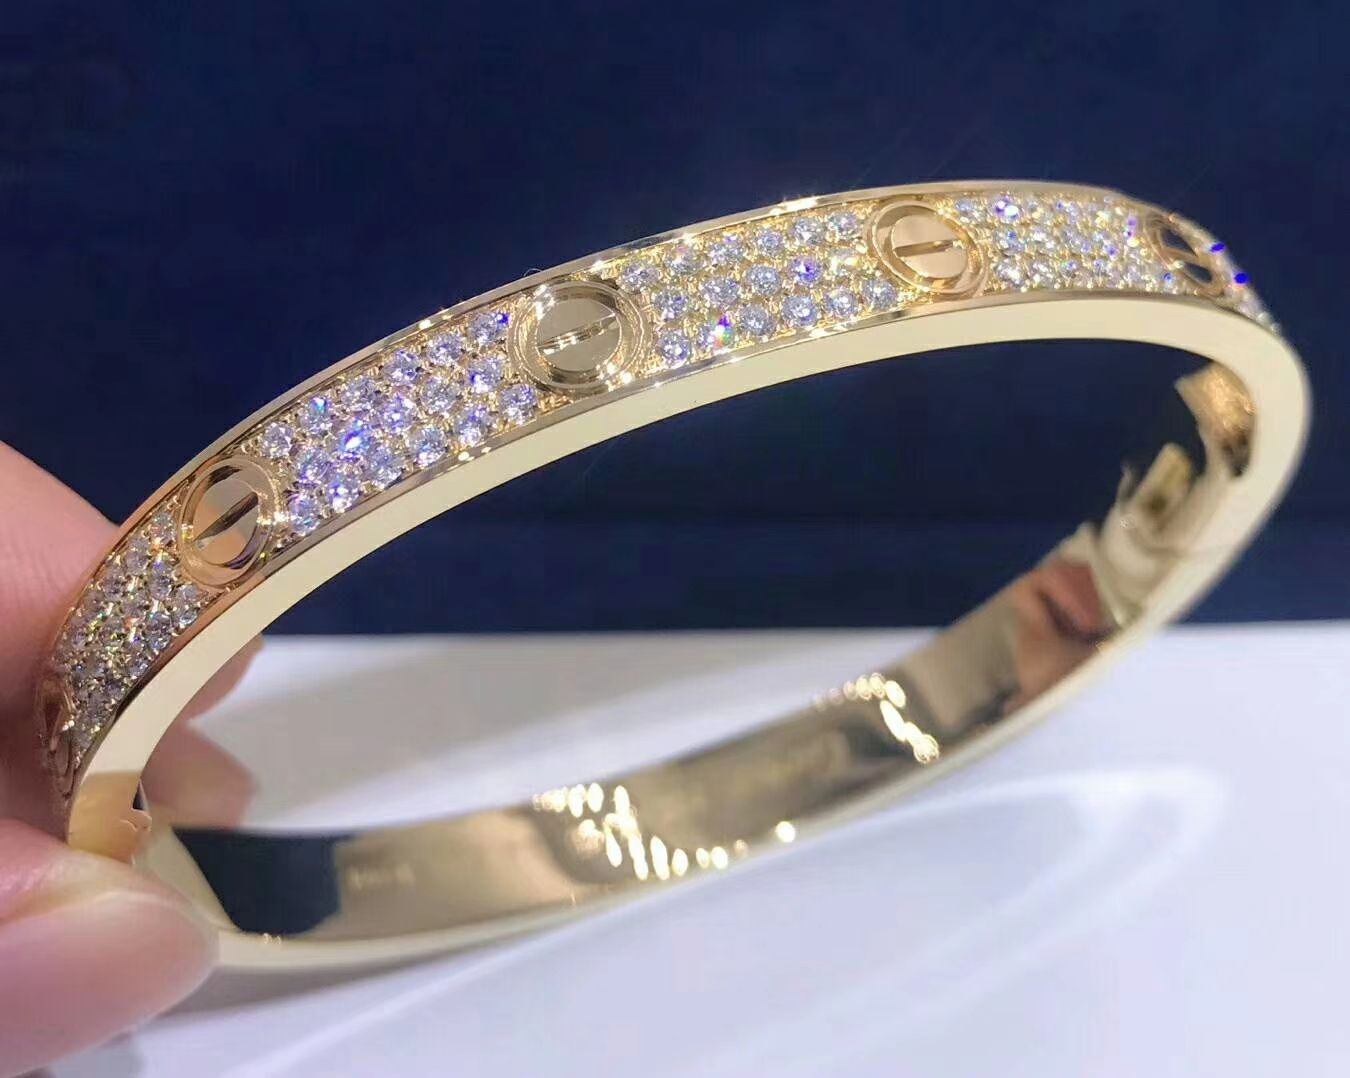 0df4cc80e93 18K Yellow Gold Cartier Love Bracelet 204 Diamond-Paved